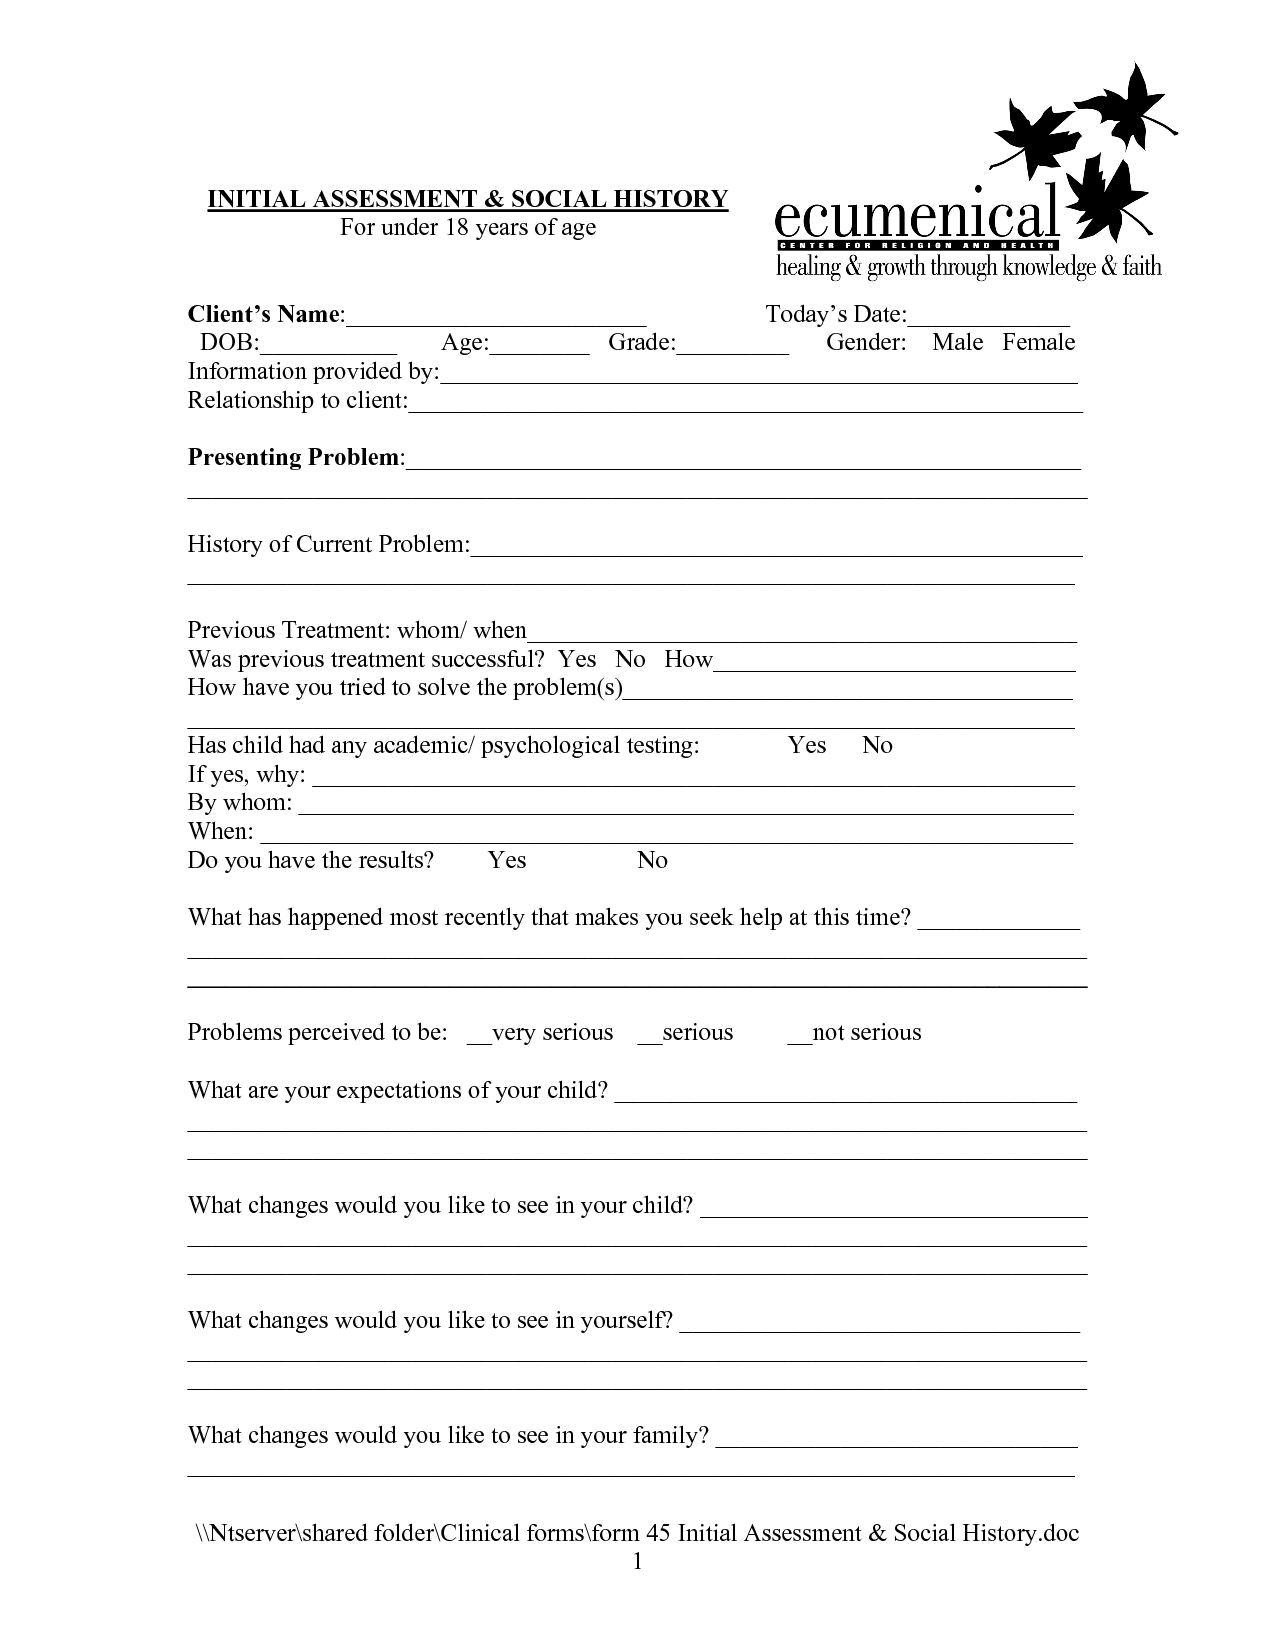 child intake assessment form - Pinep.handshakeapp.co